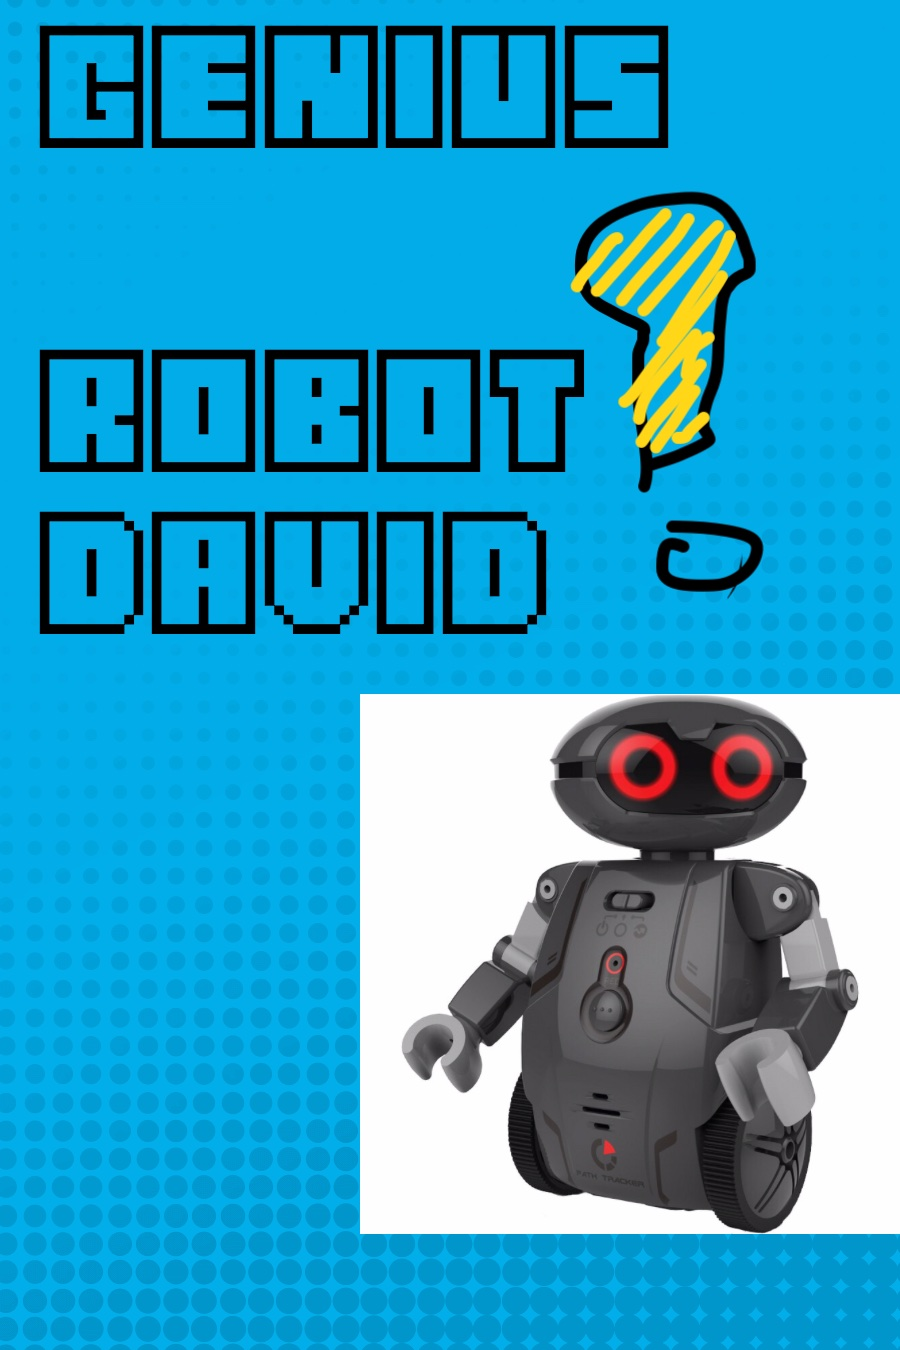 Genius Robot David